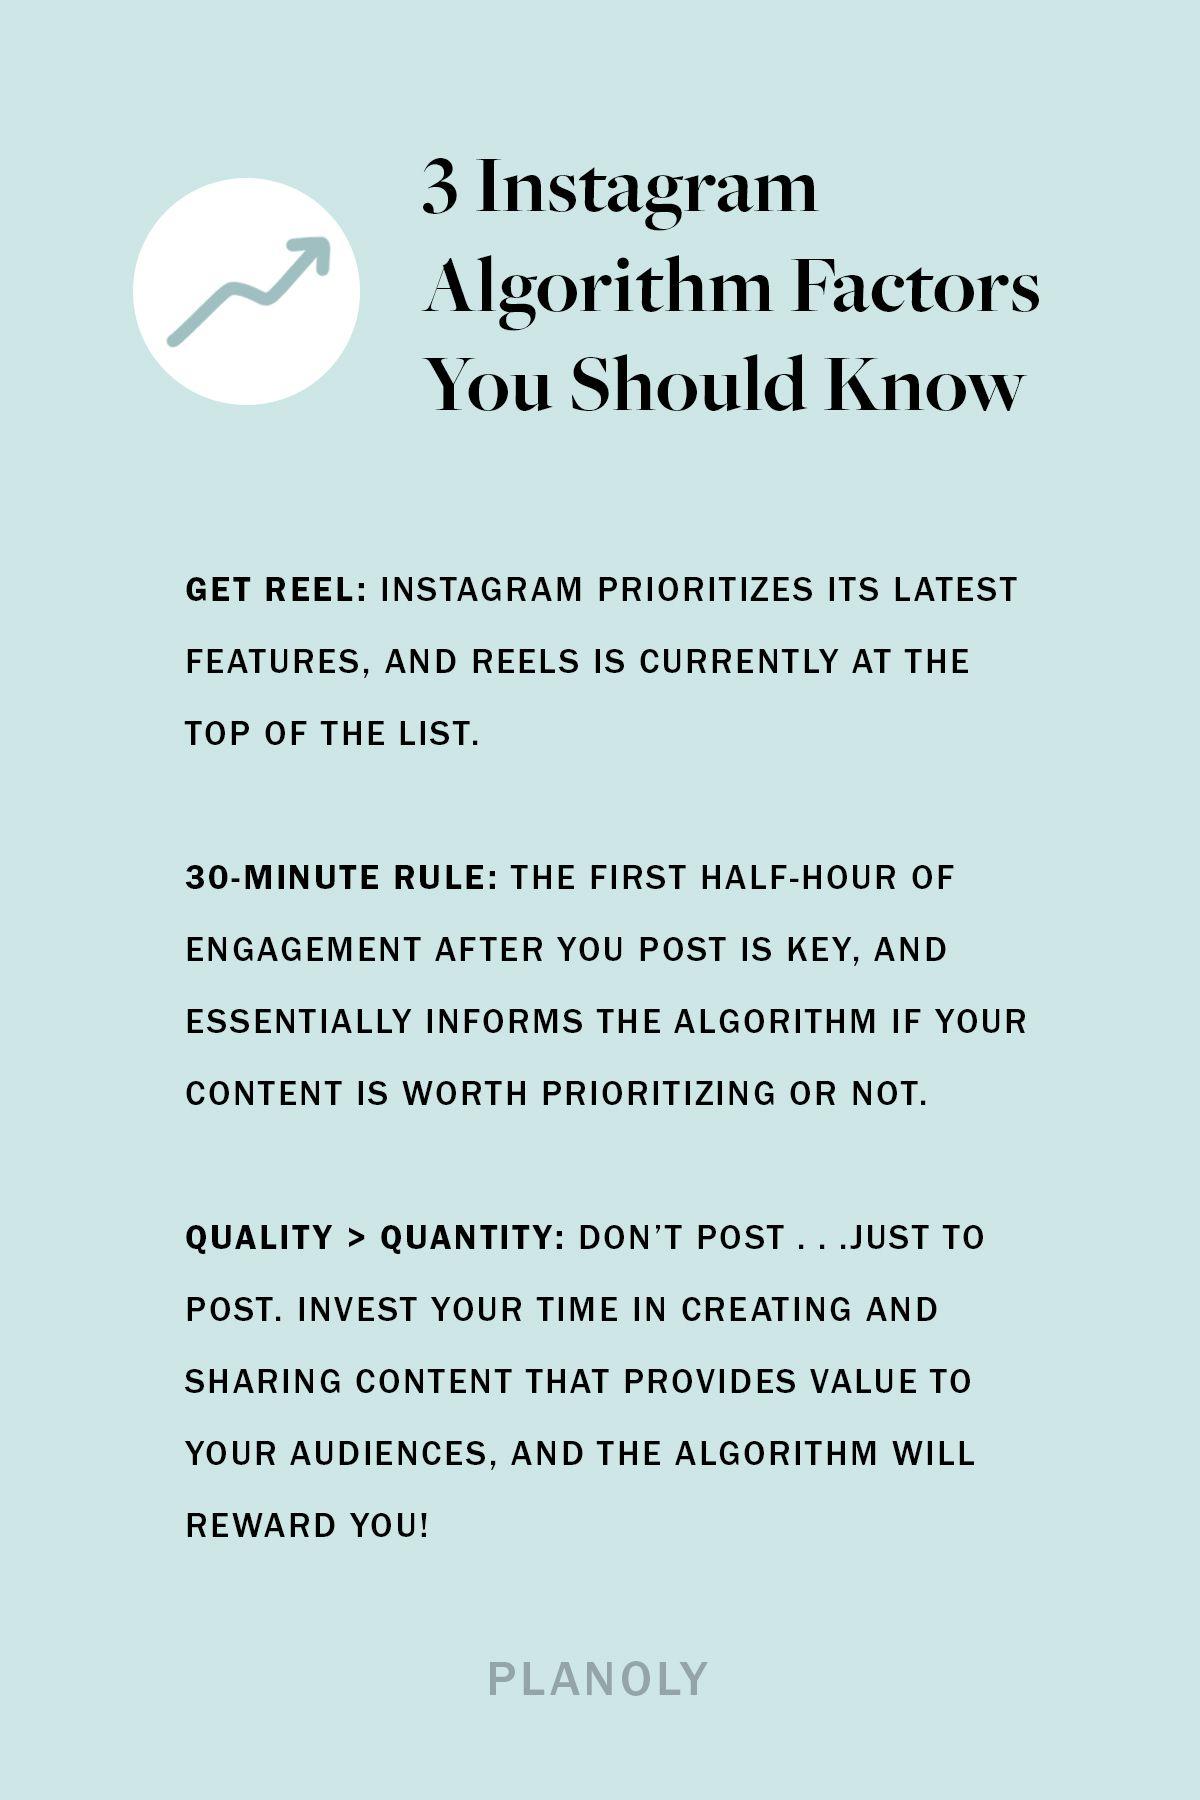 PLANOLY-Blog Post-Understanding Instagram Algorithm-Image 1